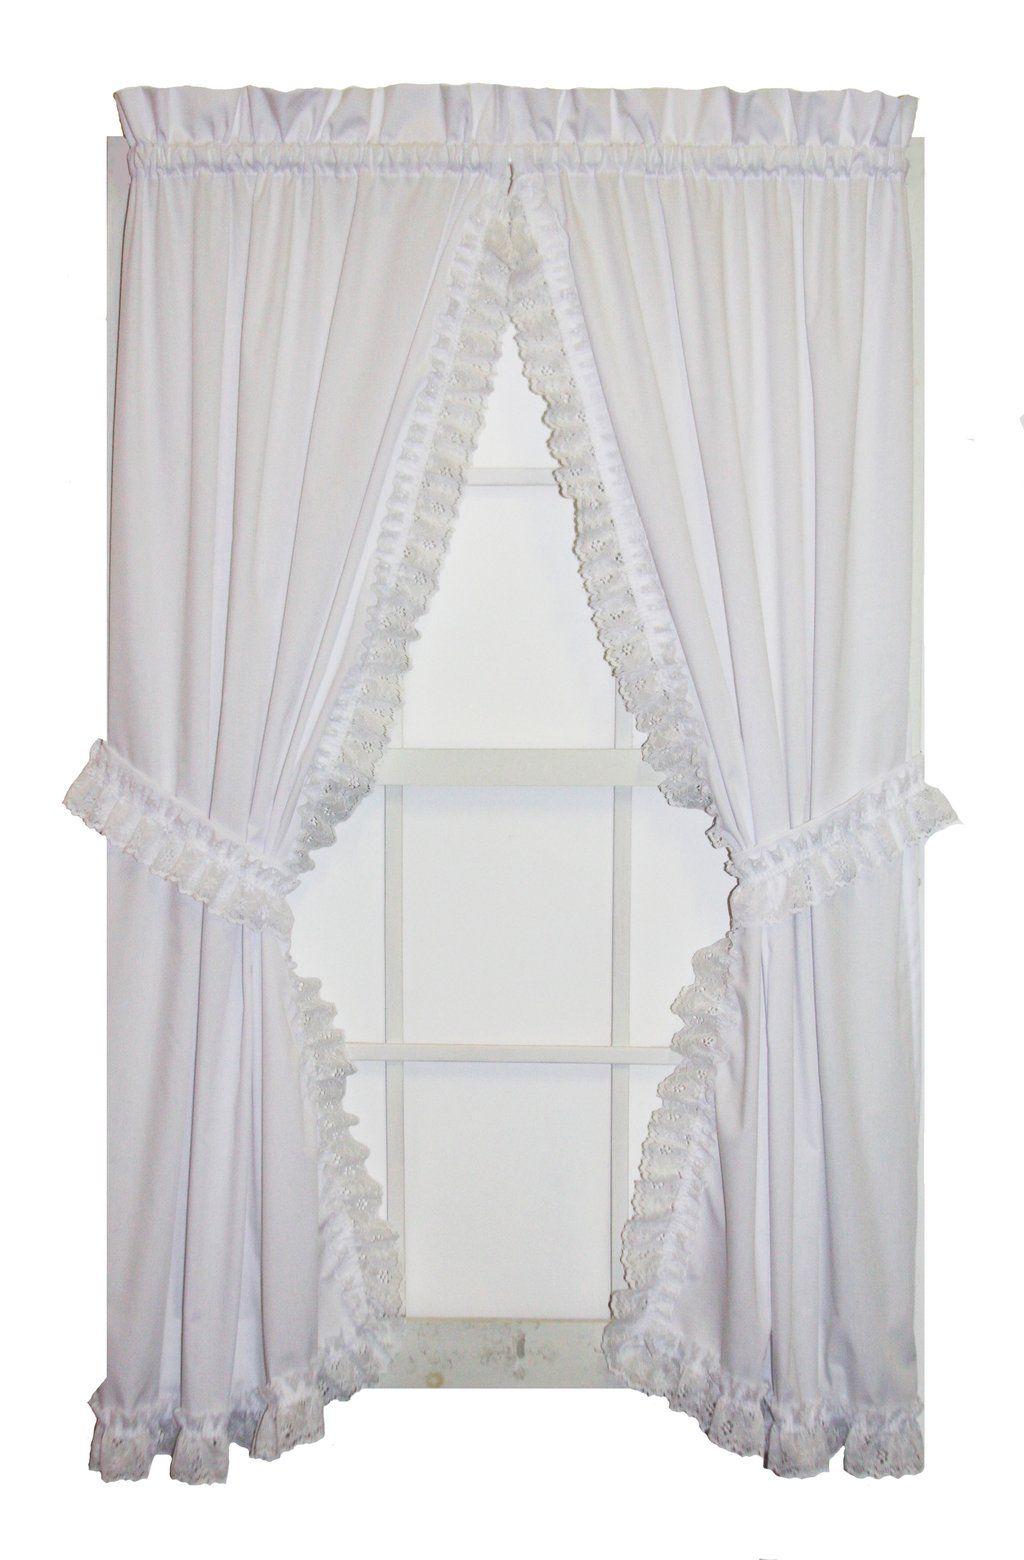 Cape Cod White Lace Ruffled Priscilla Window Curtains With Tie